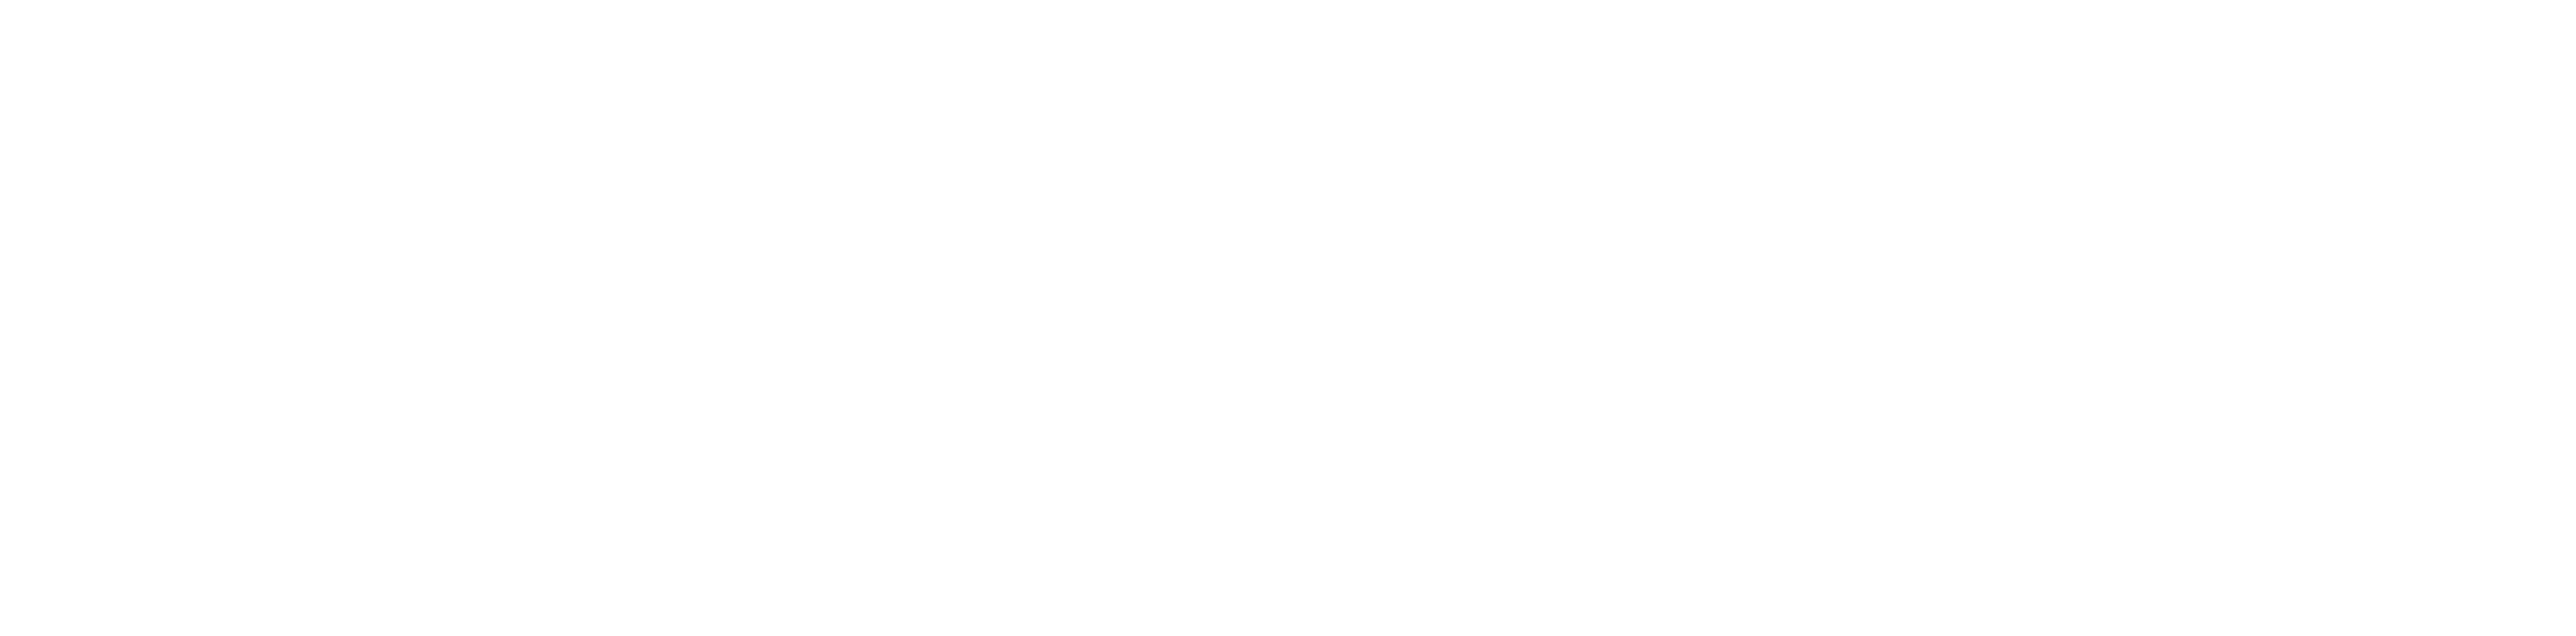 timeline_buchungsstrecke